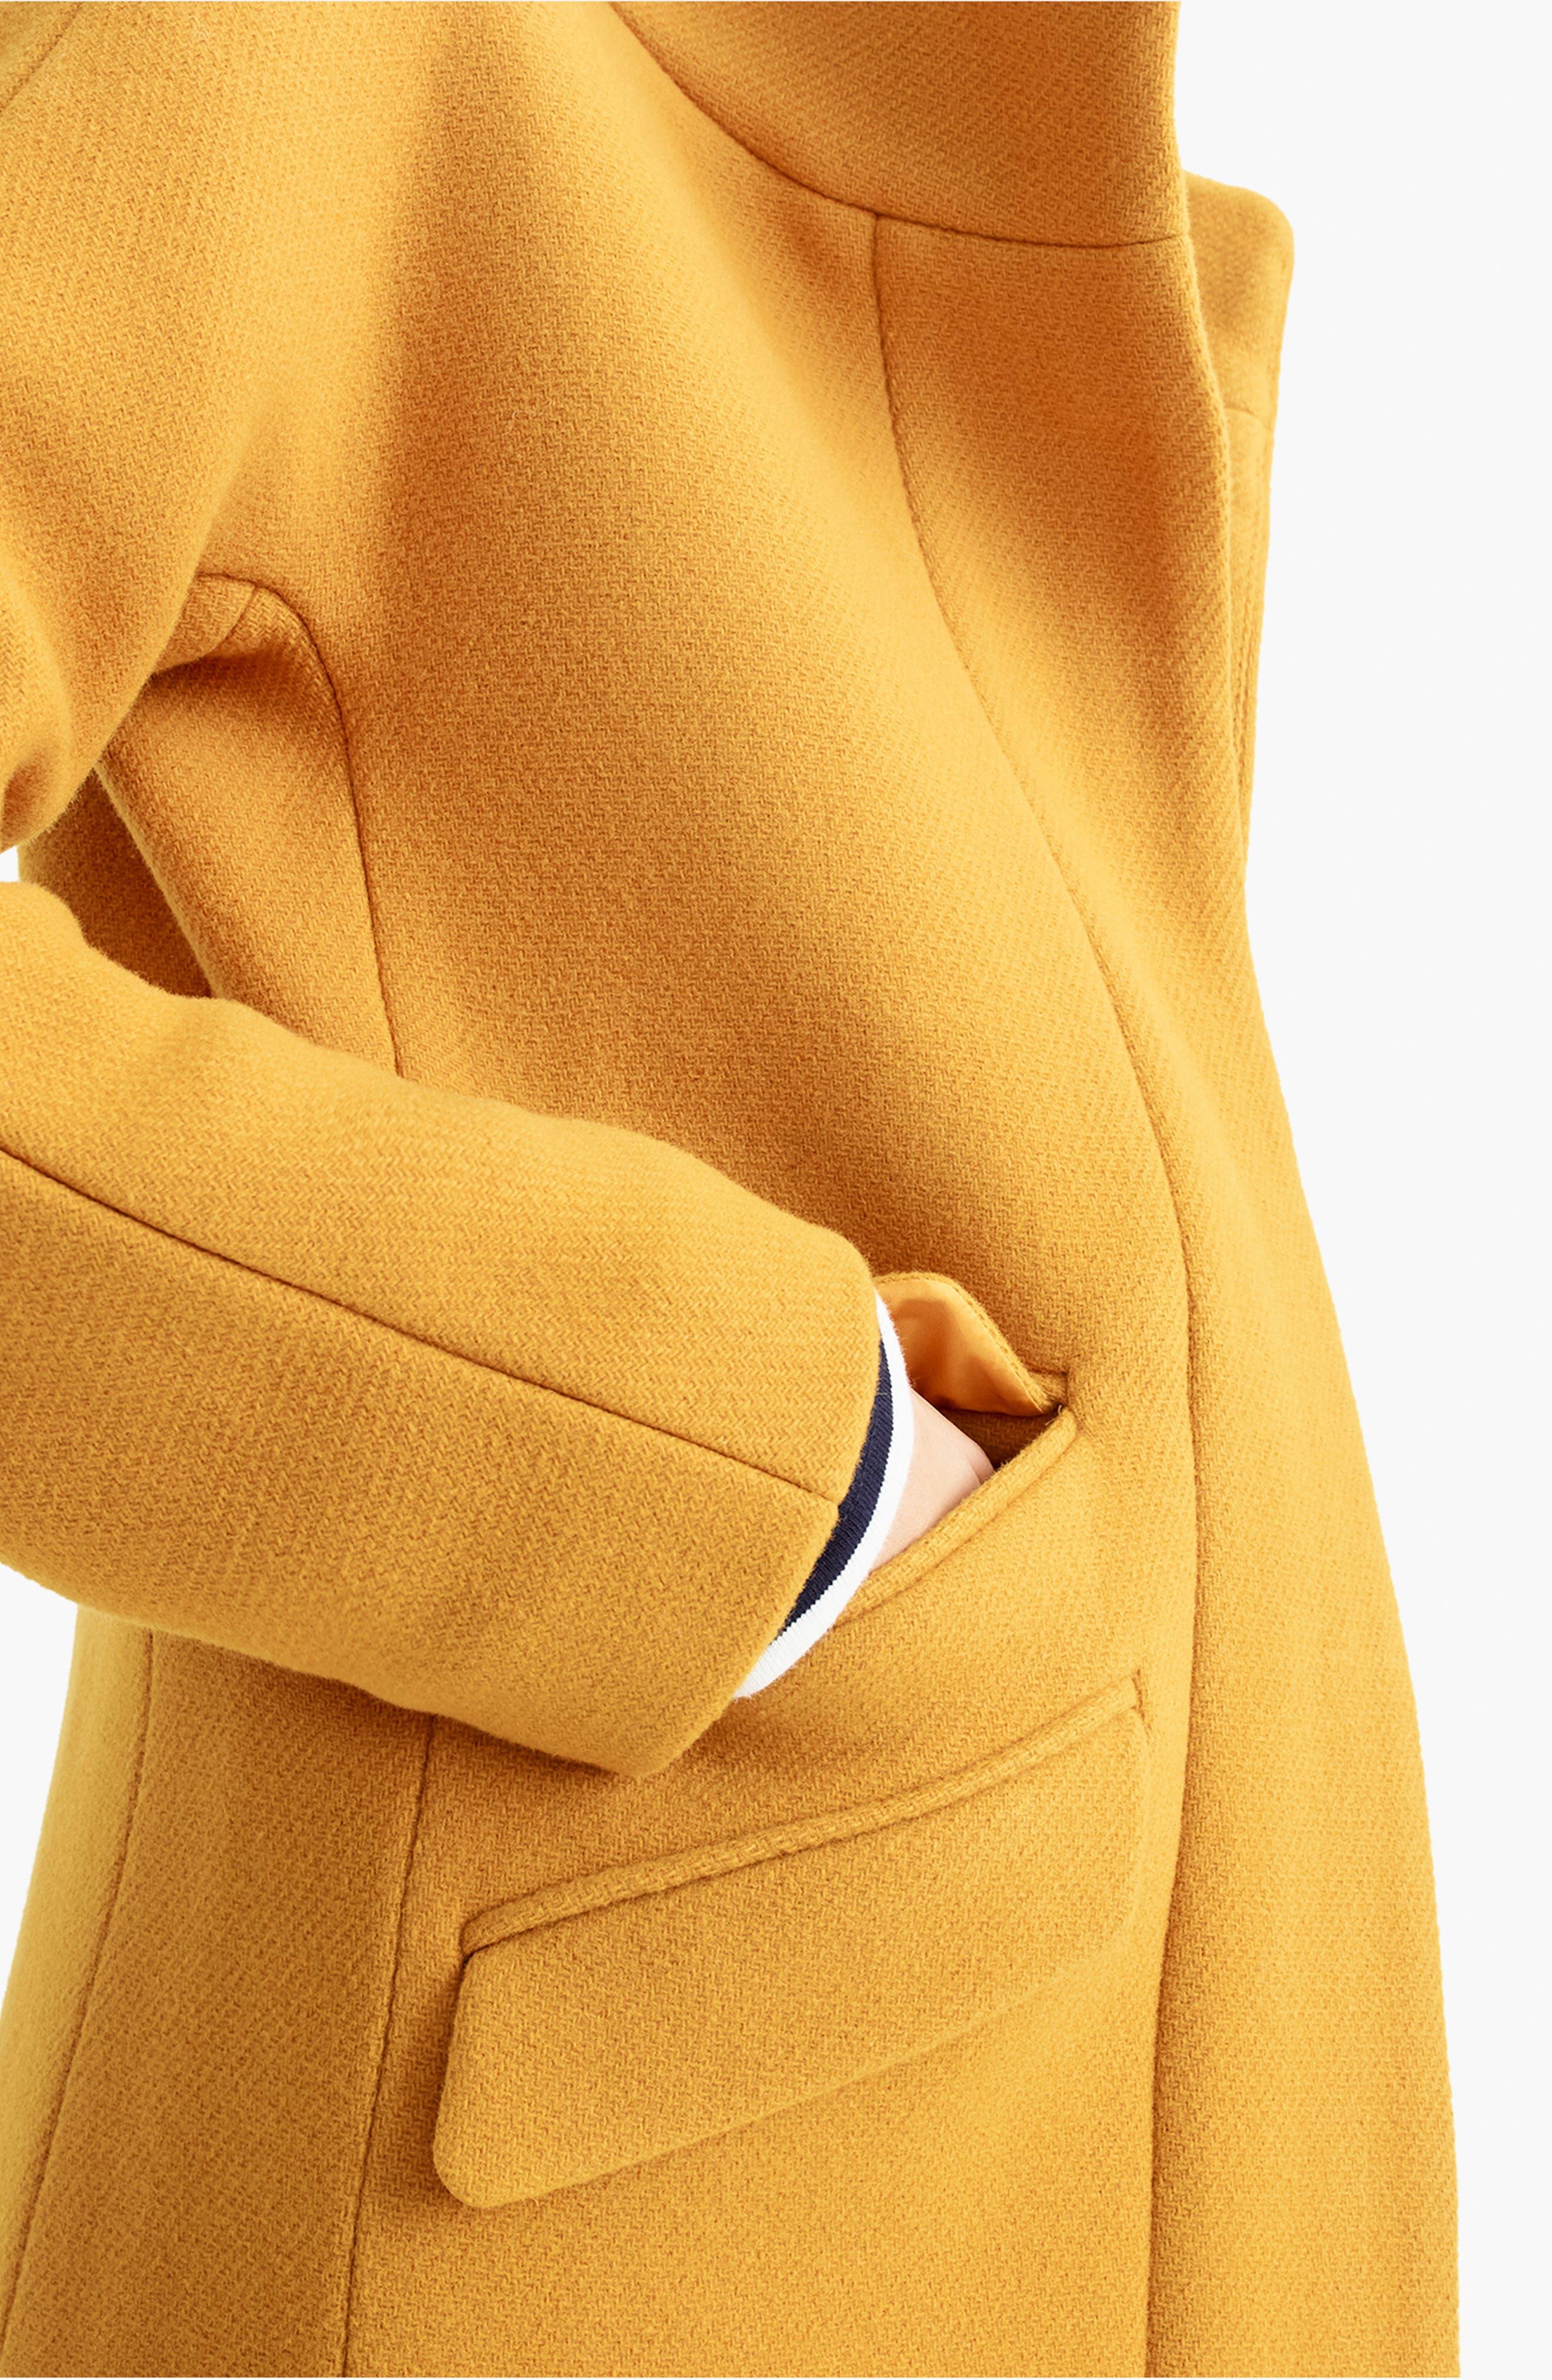 J.CREW, Stadium Cloth Cocoon Coat, Alternate thumbnail 6, color, 800